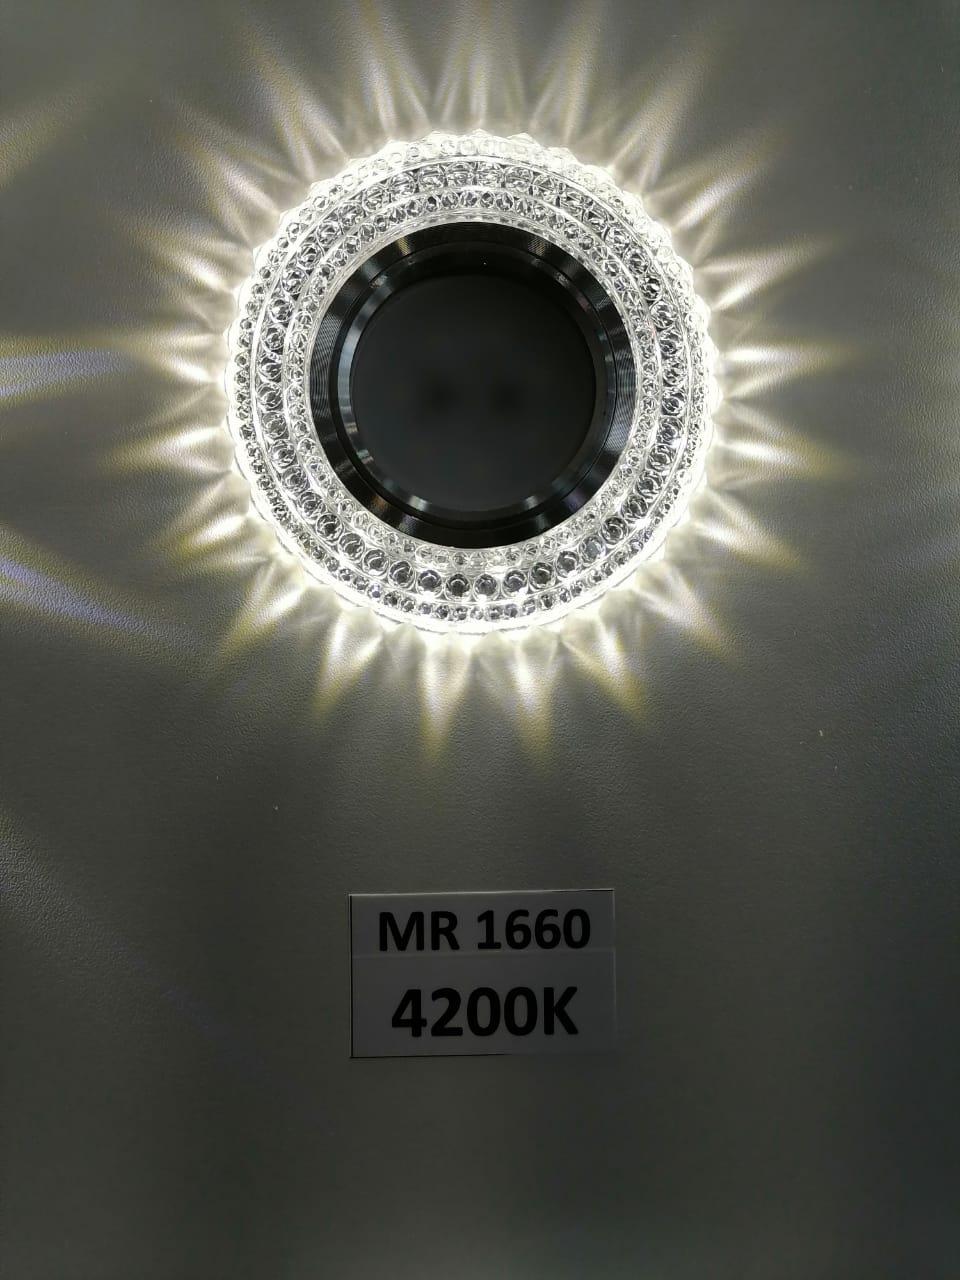 MR 1660